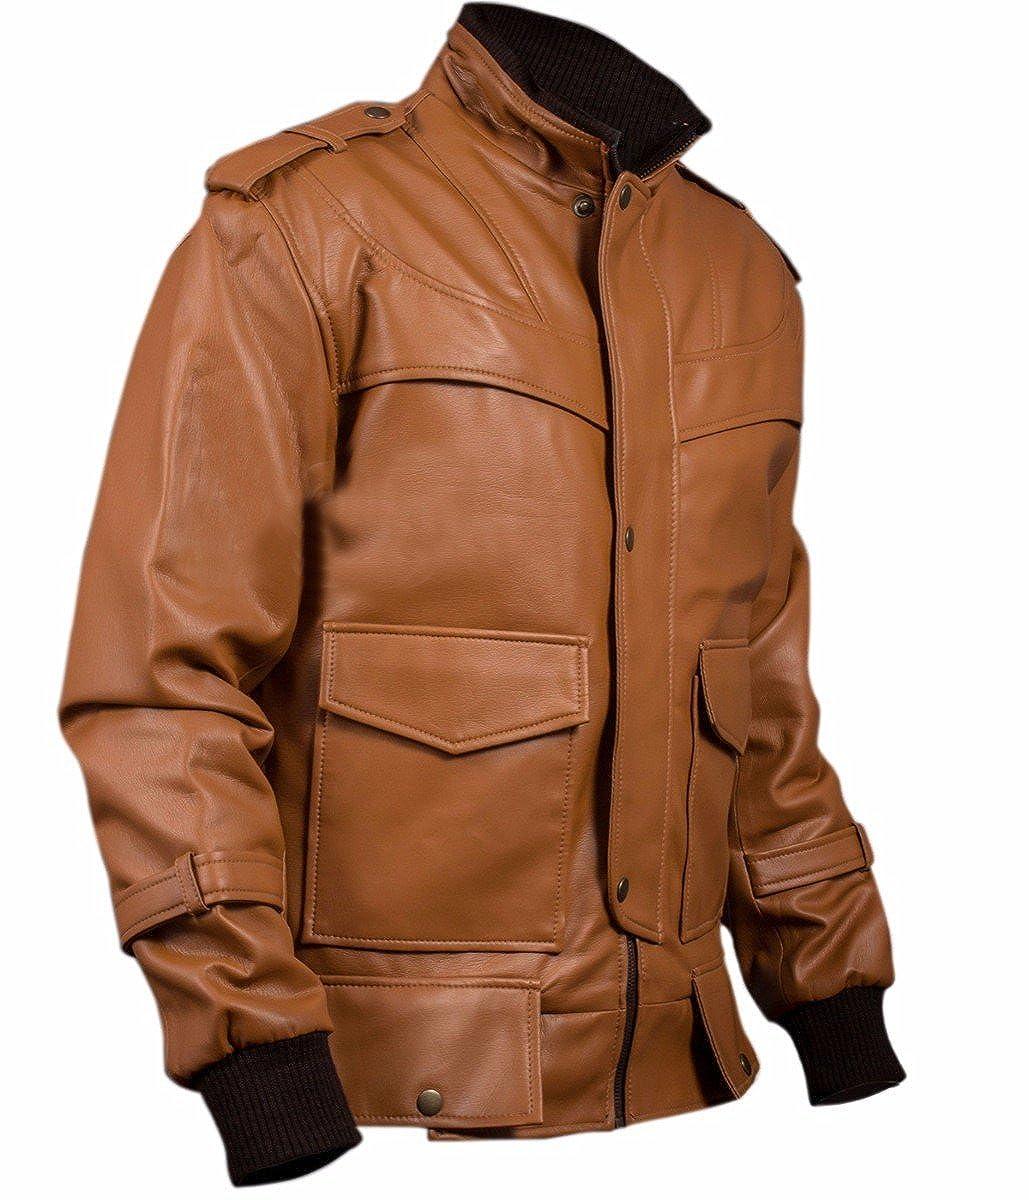 Flap Jacket Mock Bomber Col Hommes Poches Avec Veste lF1JcK